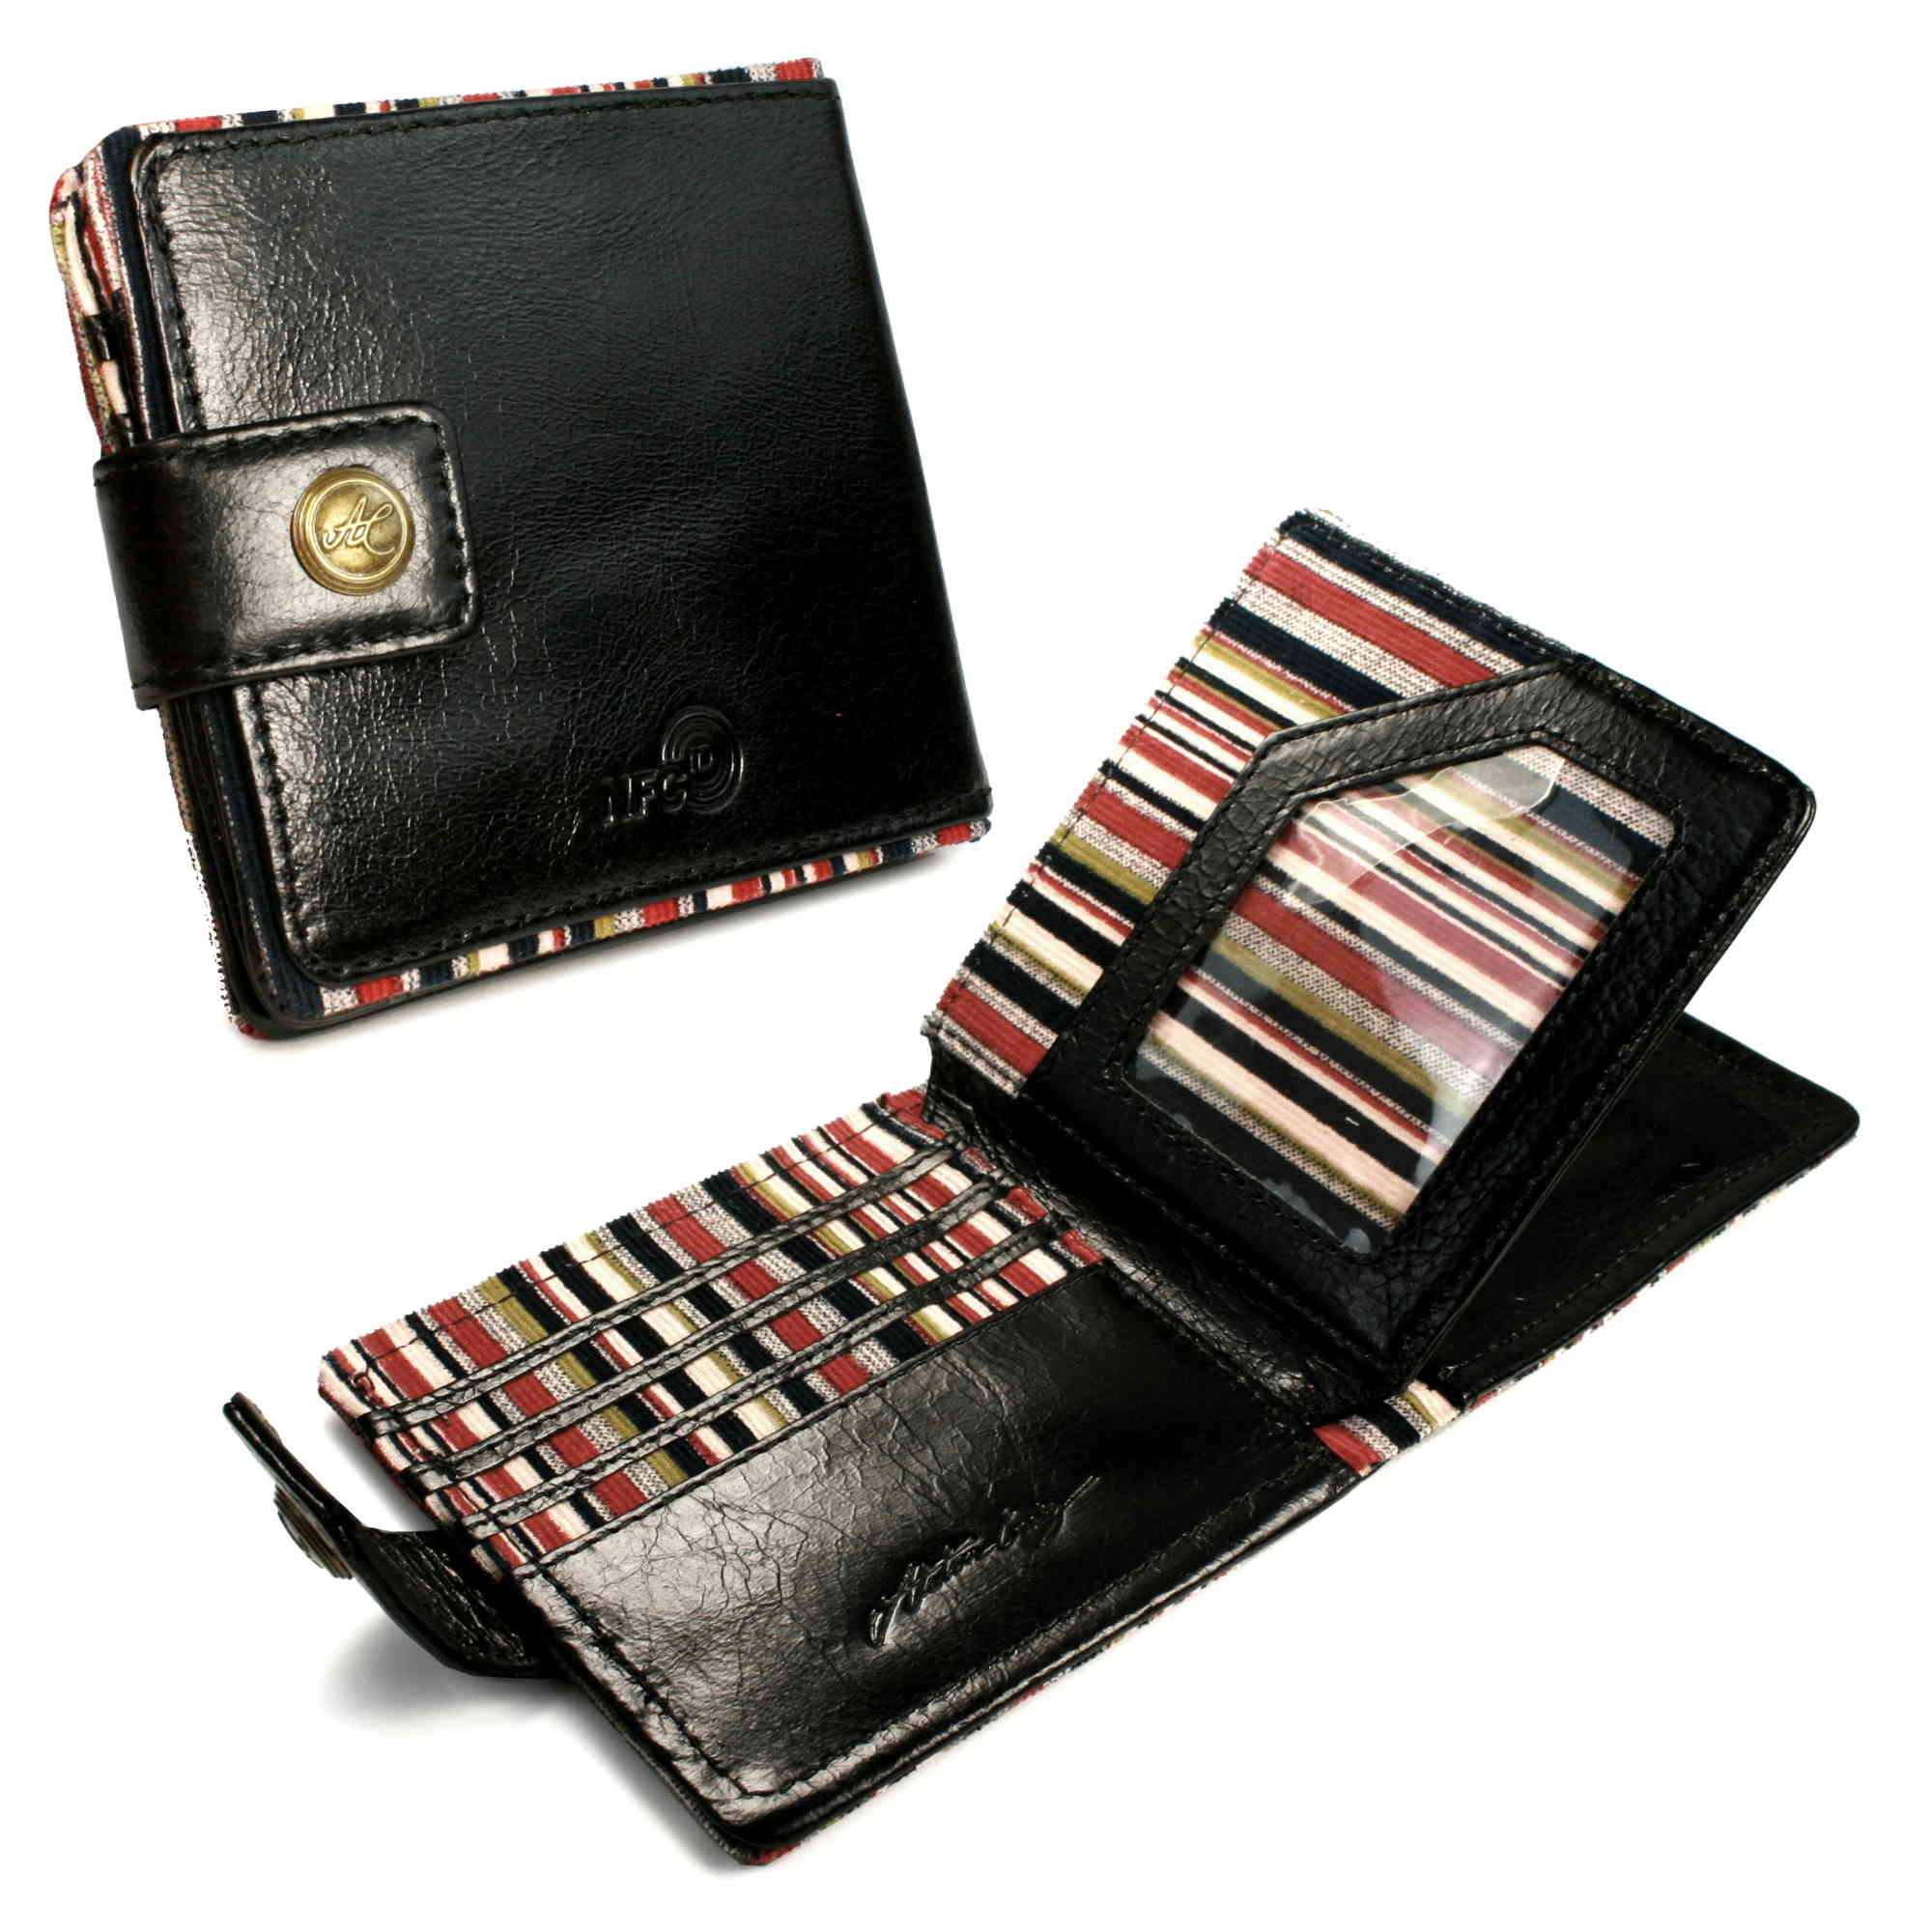 2b57c248477e6c Alston Craig Vintage Leather RFID Blocking NFC ID Mens Tec wallet   eBay